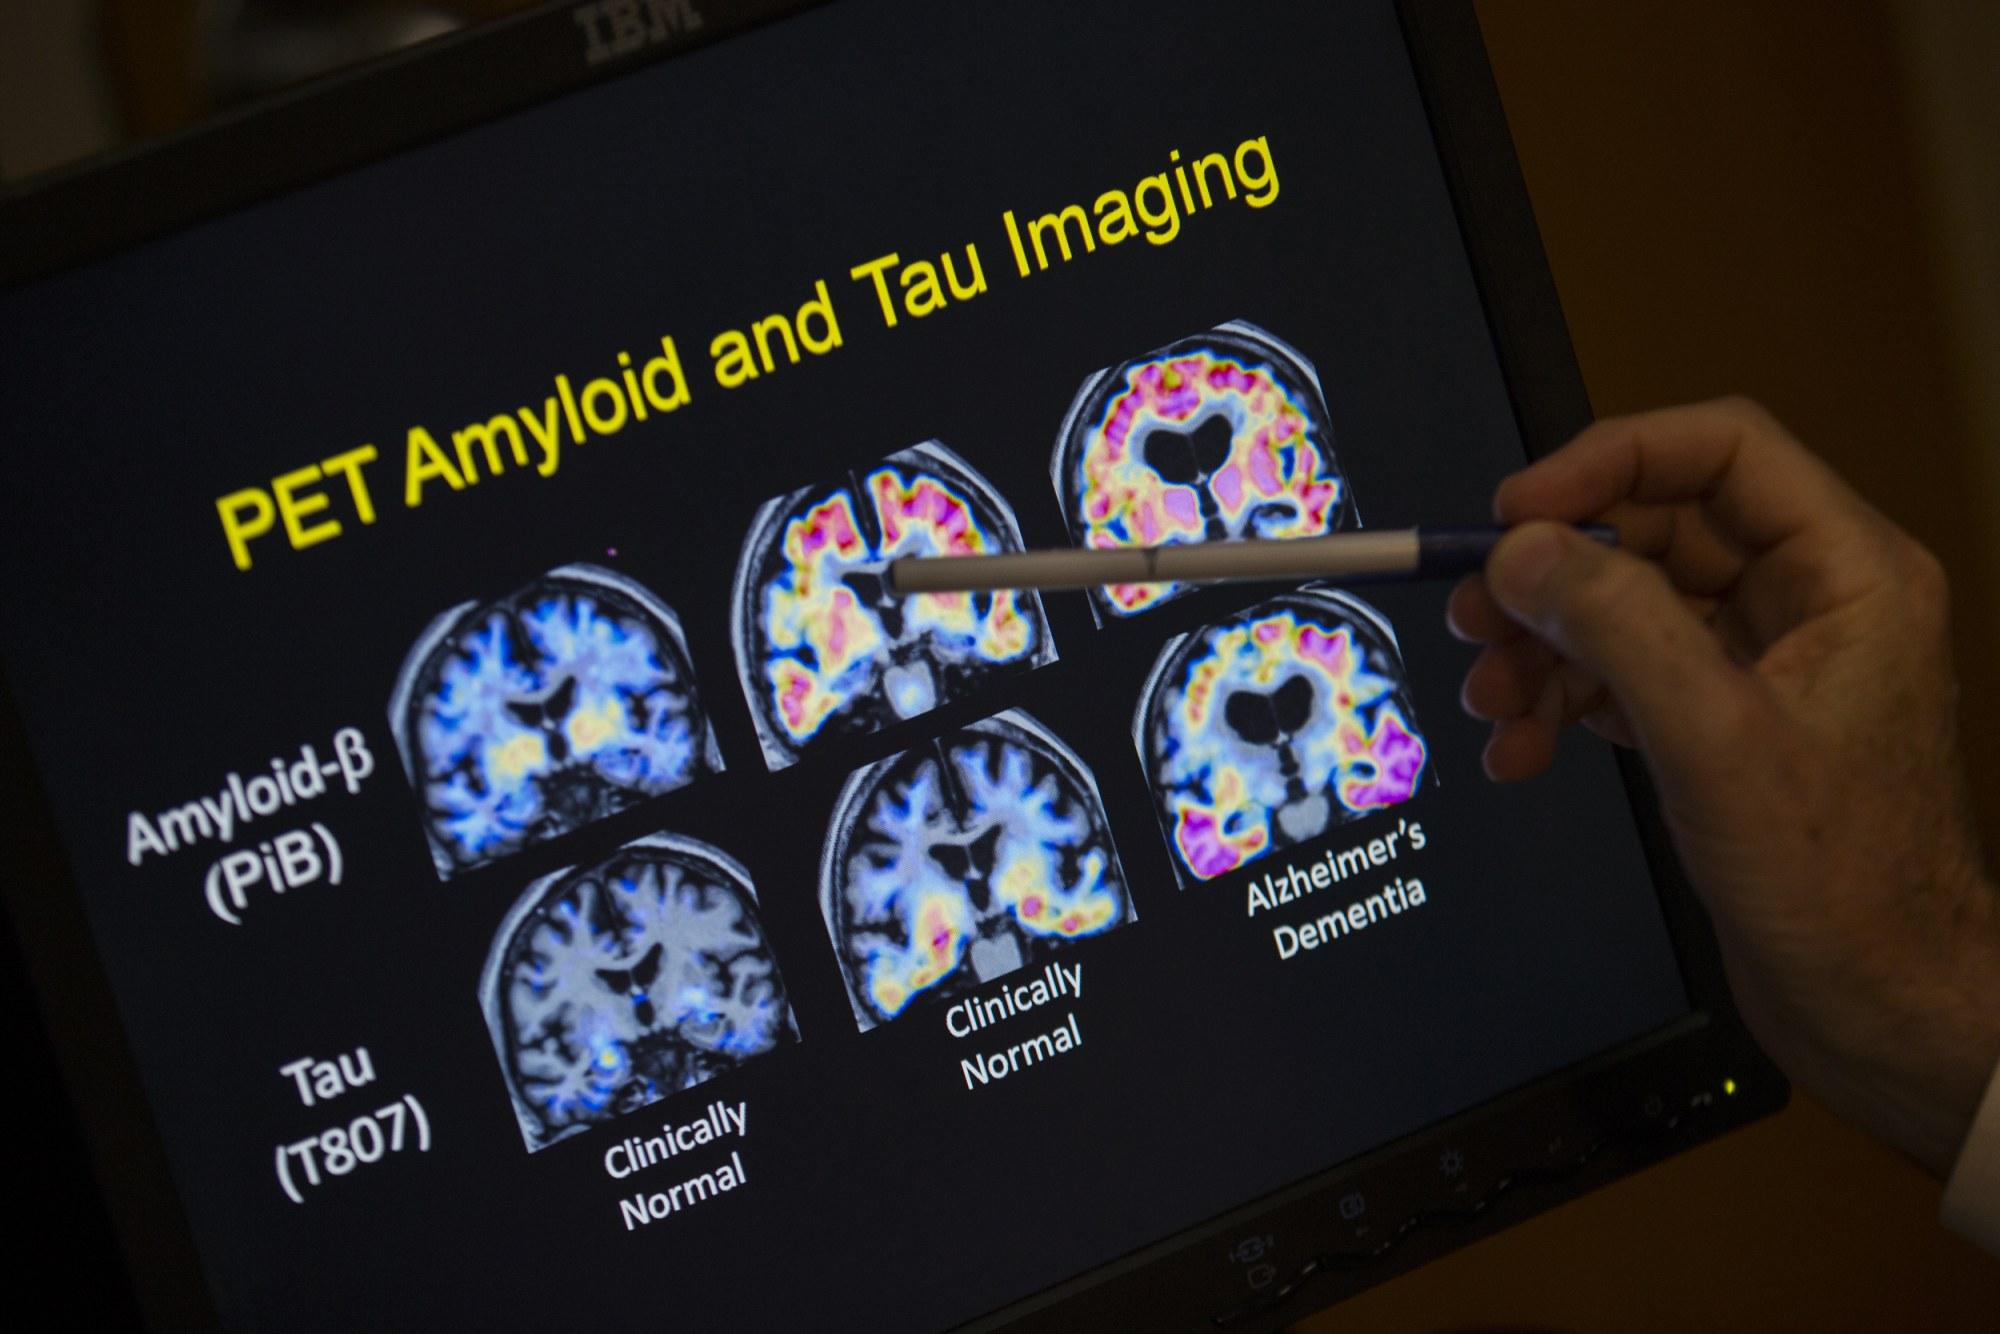 Few seniors are getting routine memory checkups